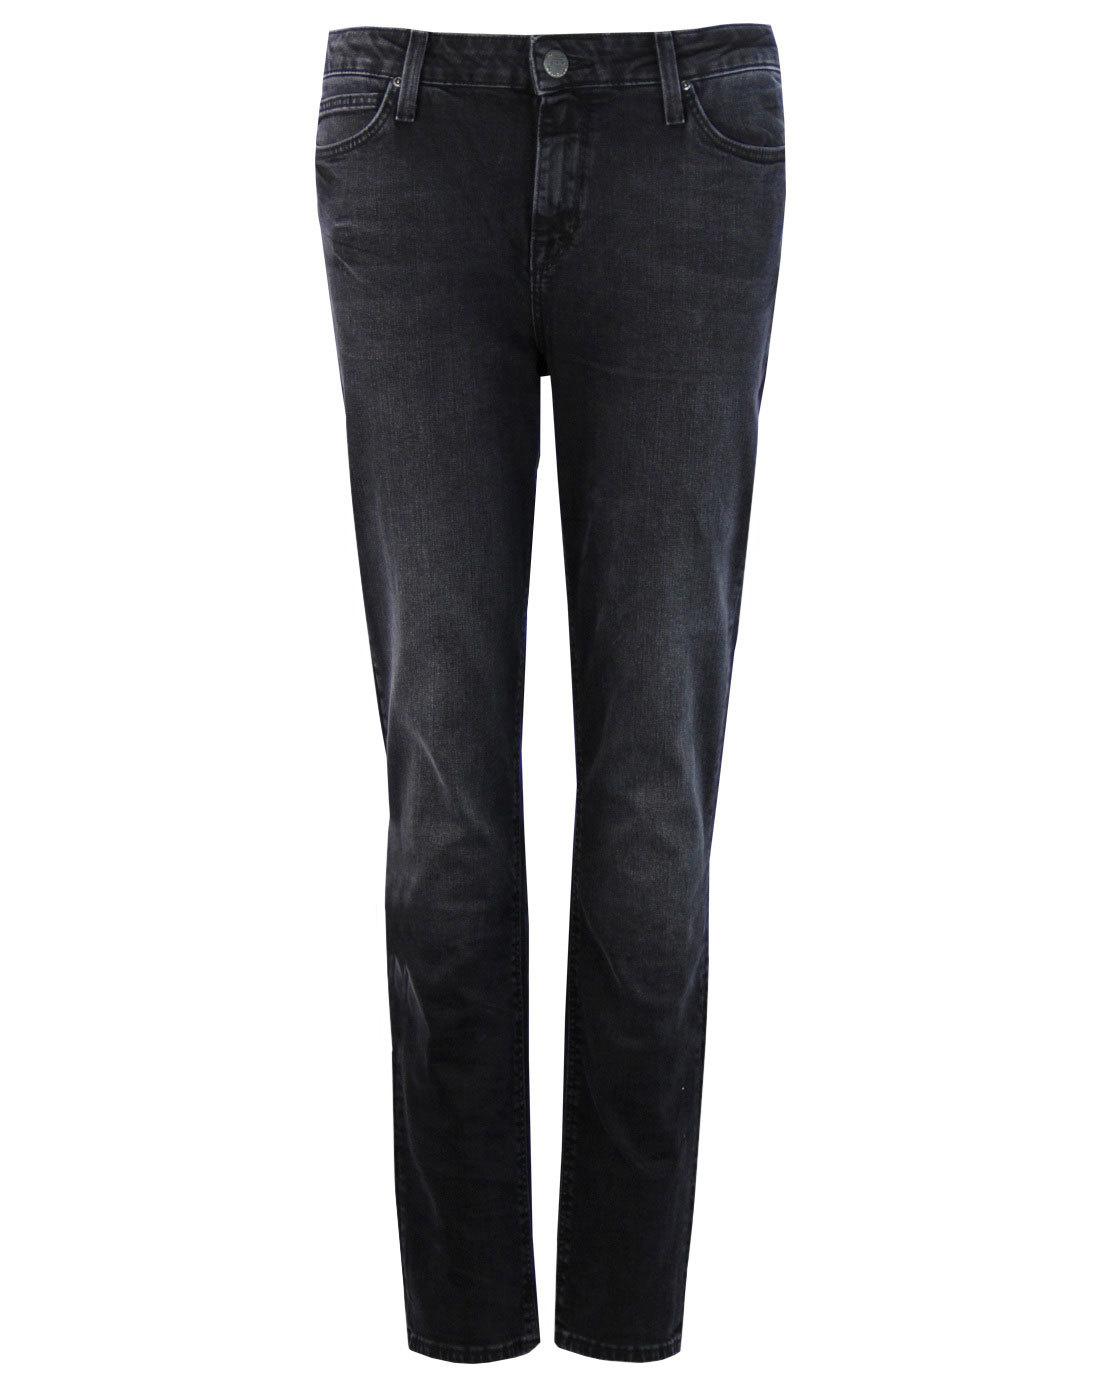 Elly LEE High Waist Slim Straight Denim Jeans (DR)